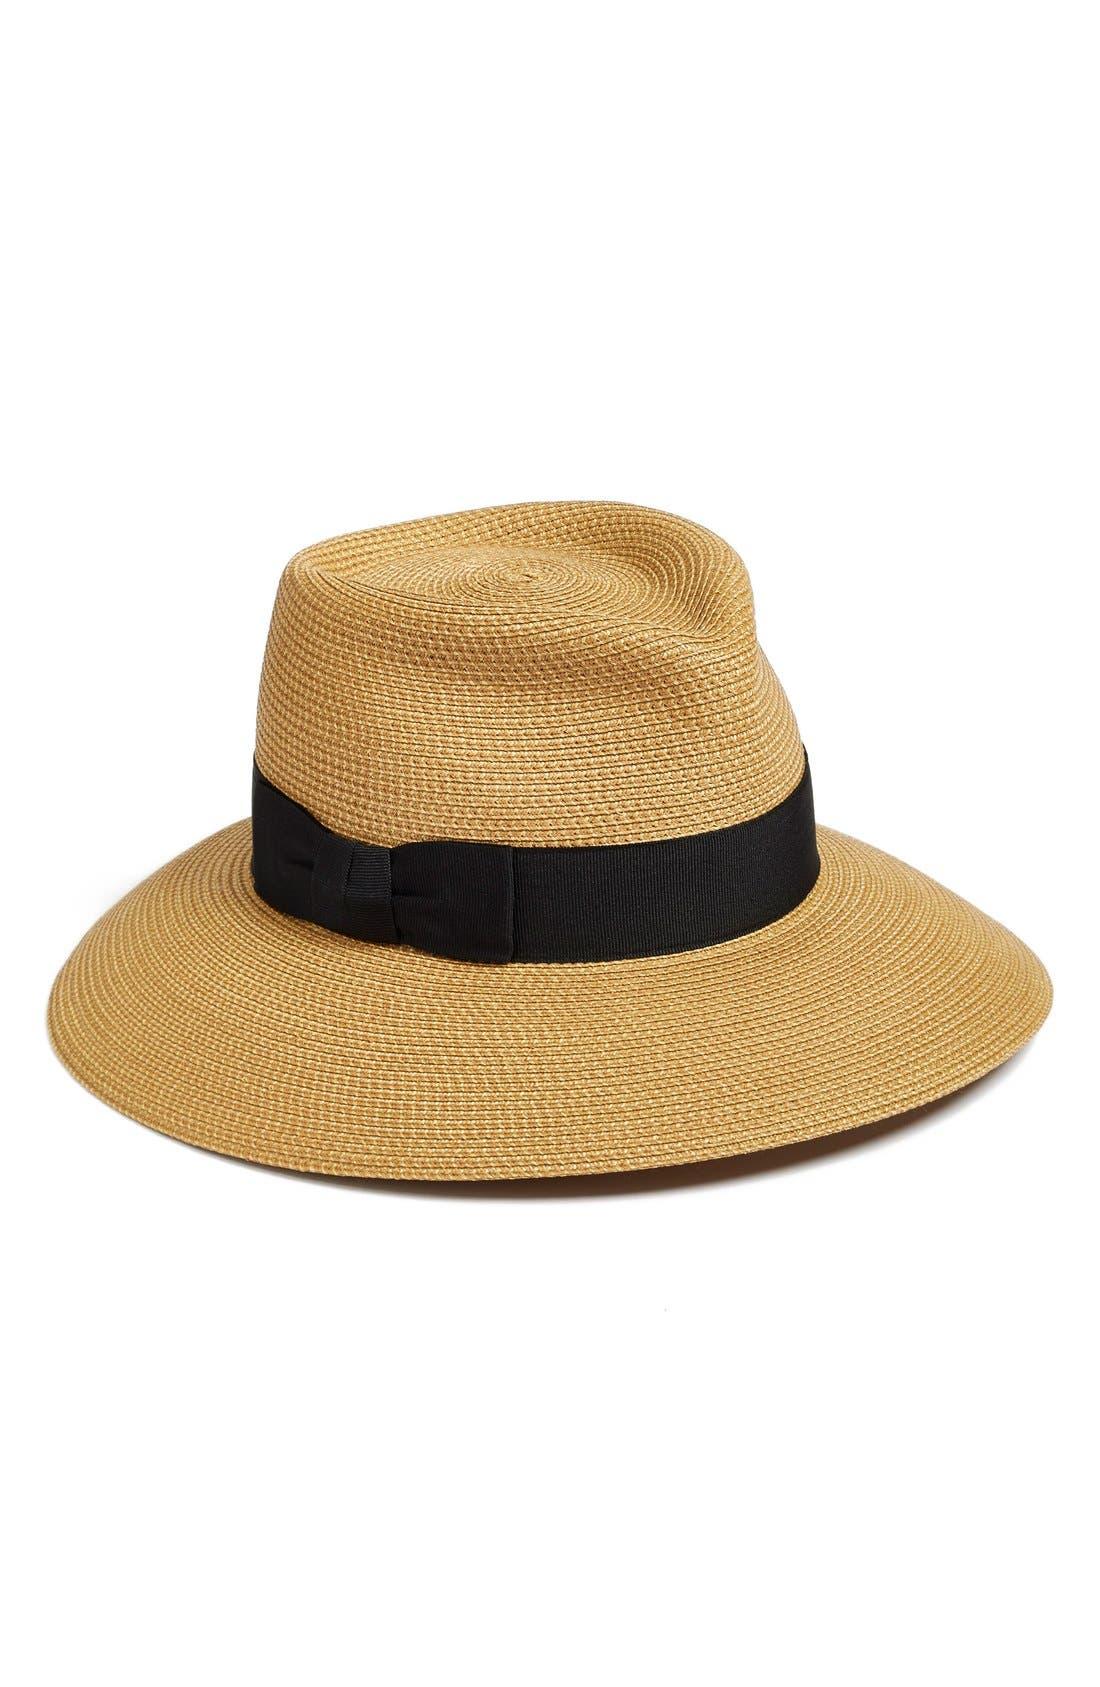 'Phoenix' Packable Fedora Sun Hat,                             Main thumbnail 1, color,                             Natural/ Black